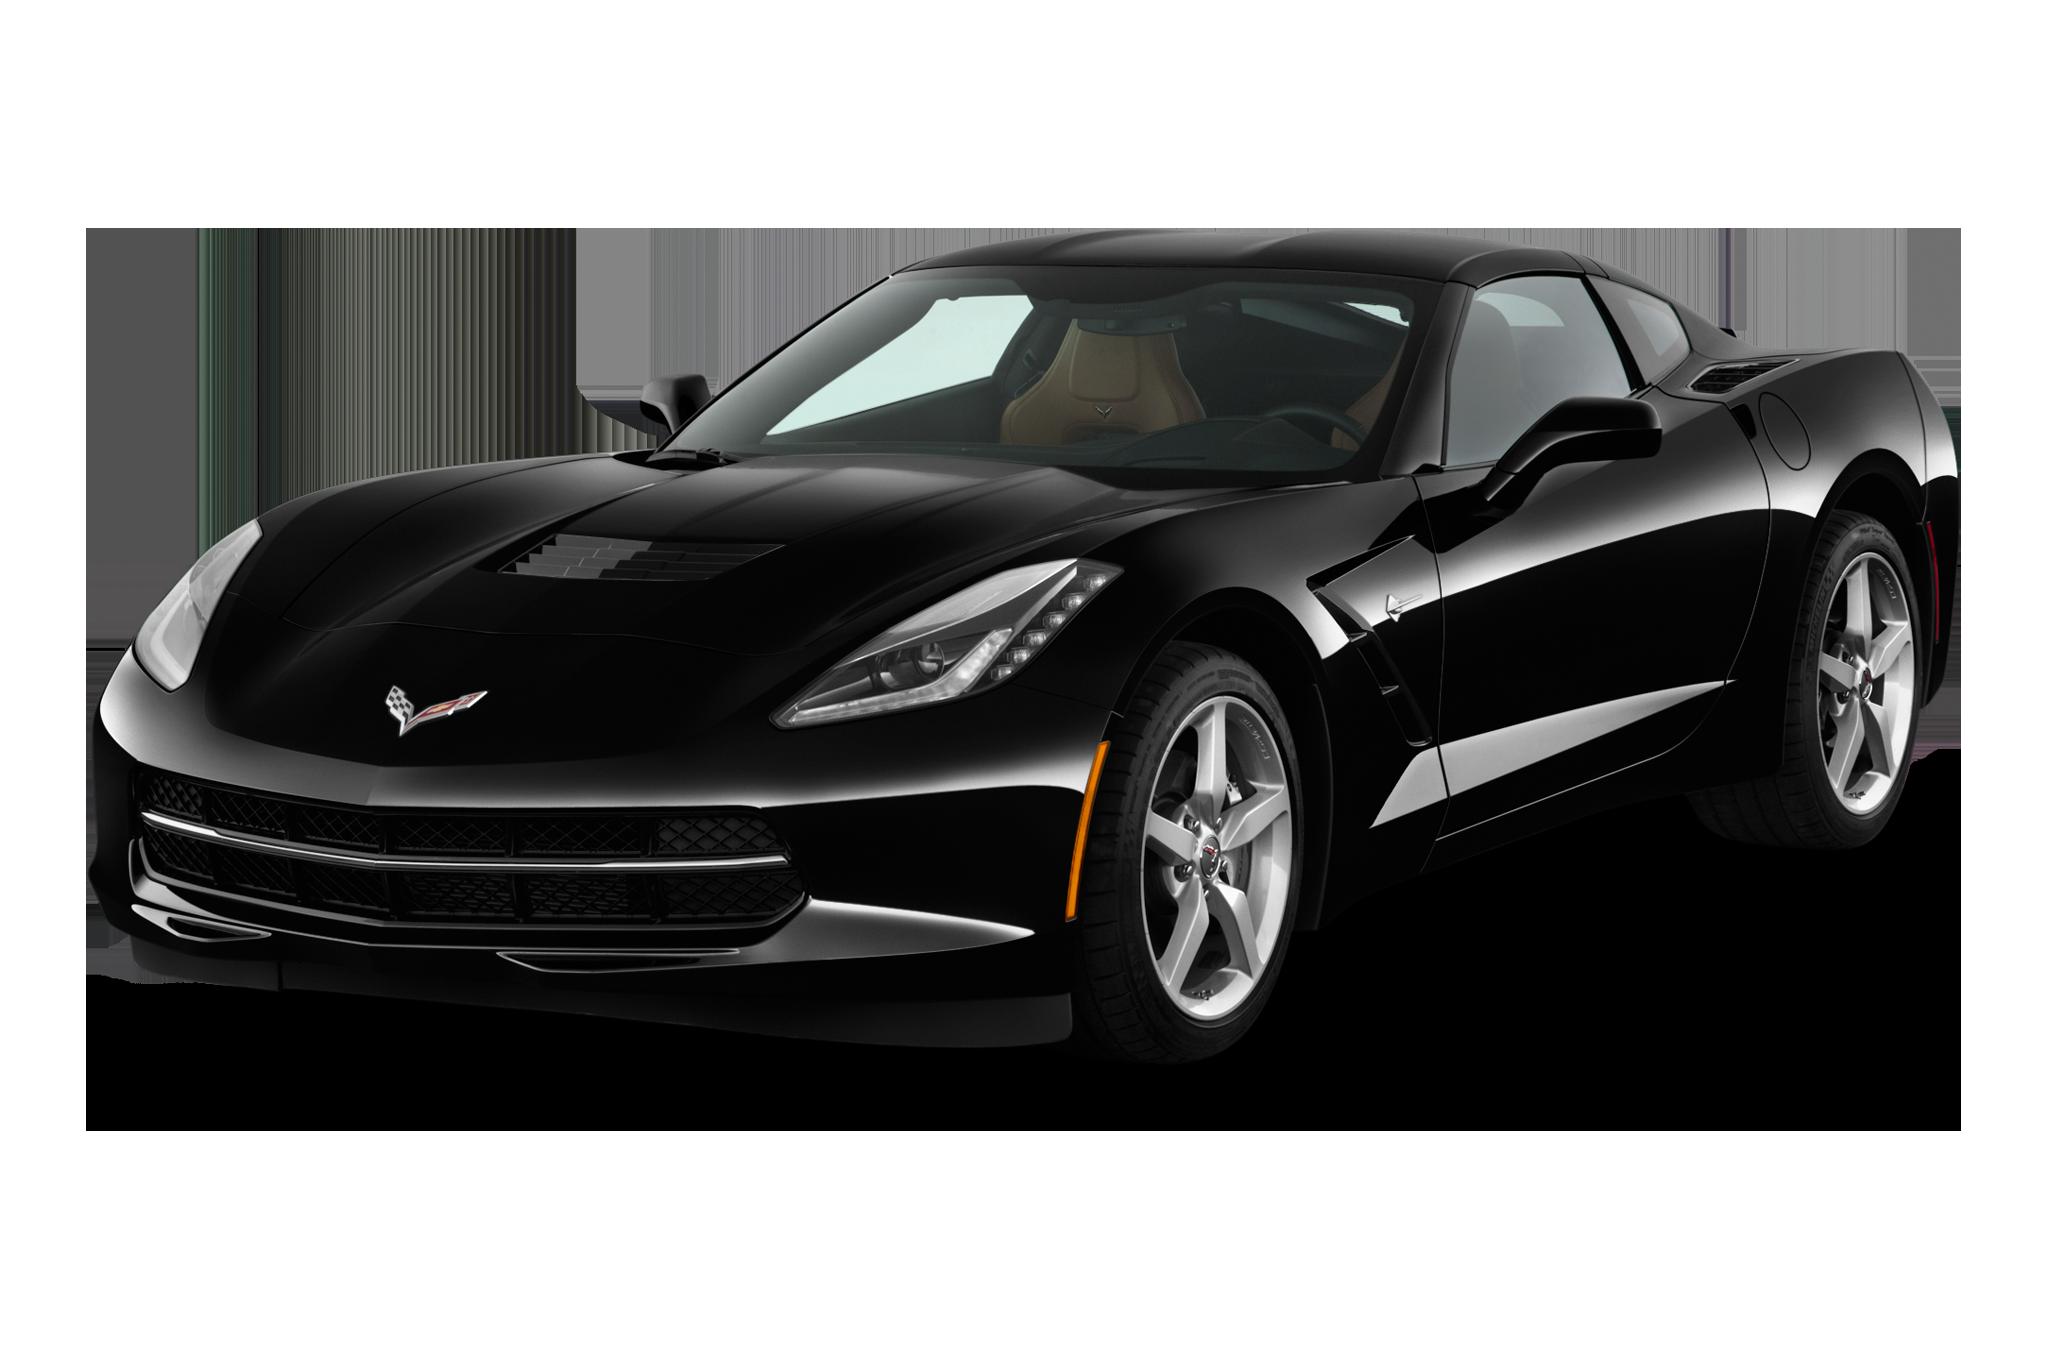 2019 chevrolet corvette zr1 to debut at 2017 dubai motor show automobile magazine. Black Bedroom Furniture Sets. Home Design Ideas